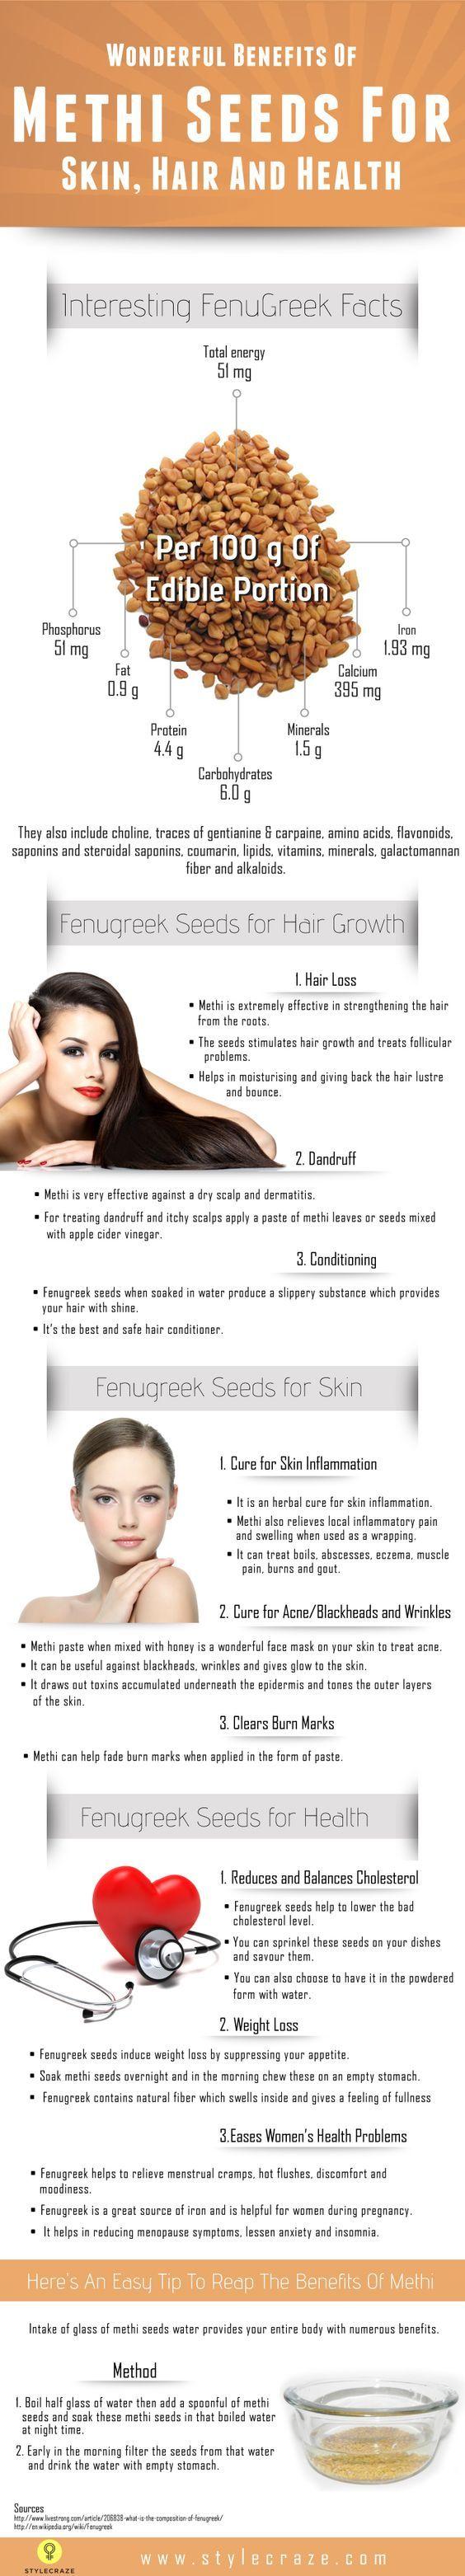 30 Wonderful Benefits Of Methi/Fenugreek Seeds For Skin, Hair And Health